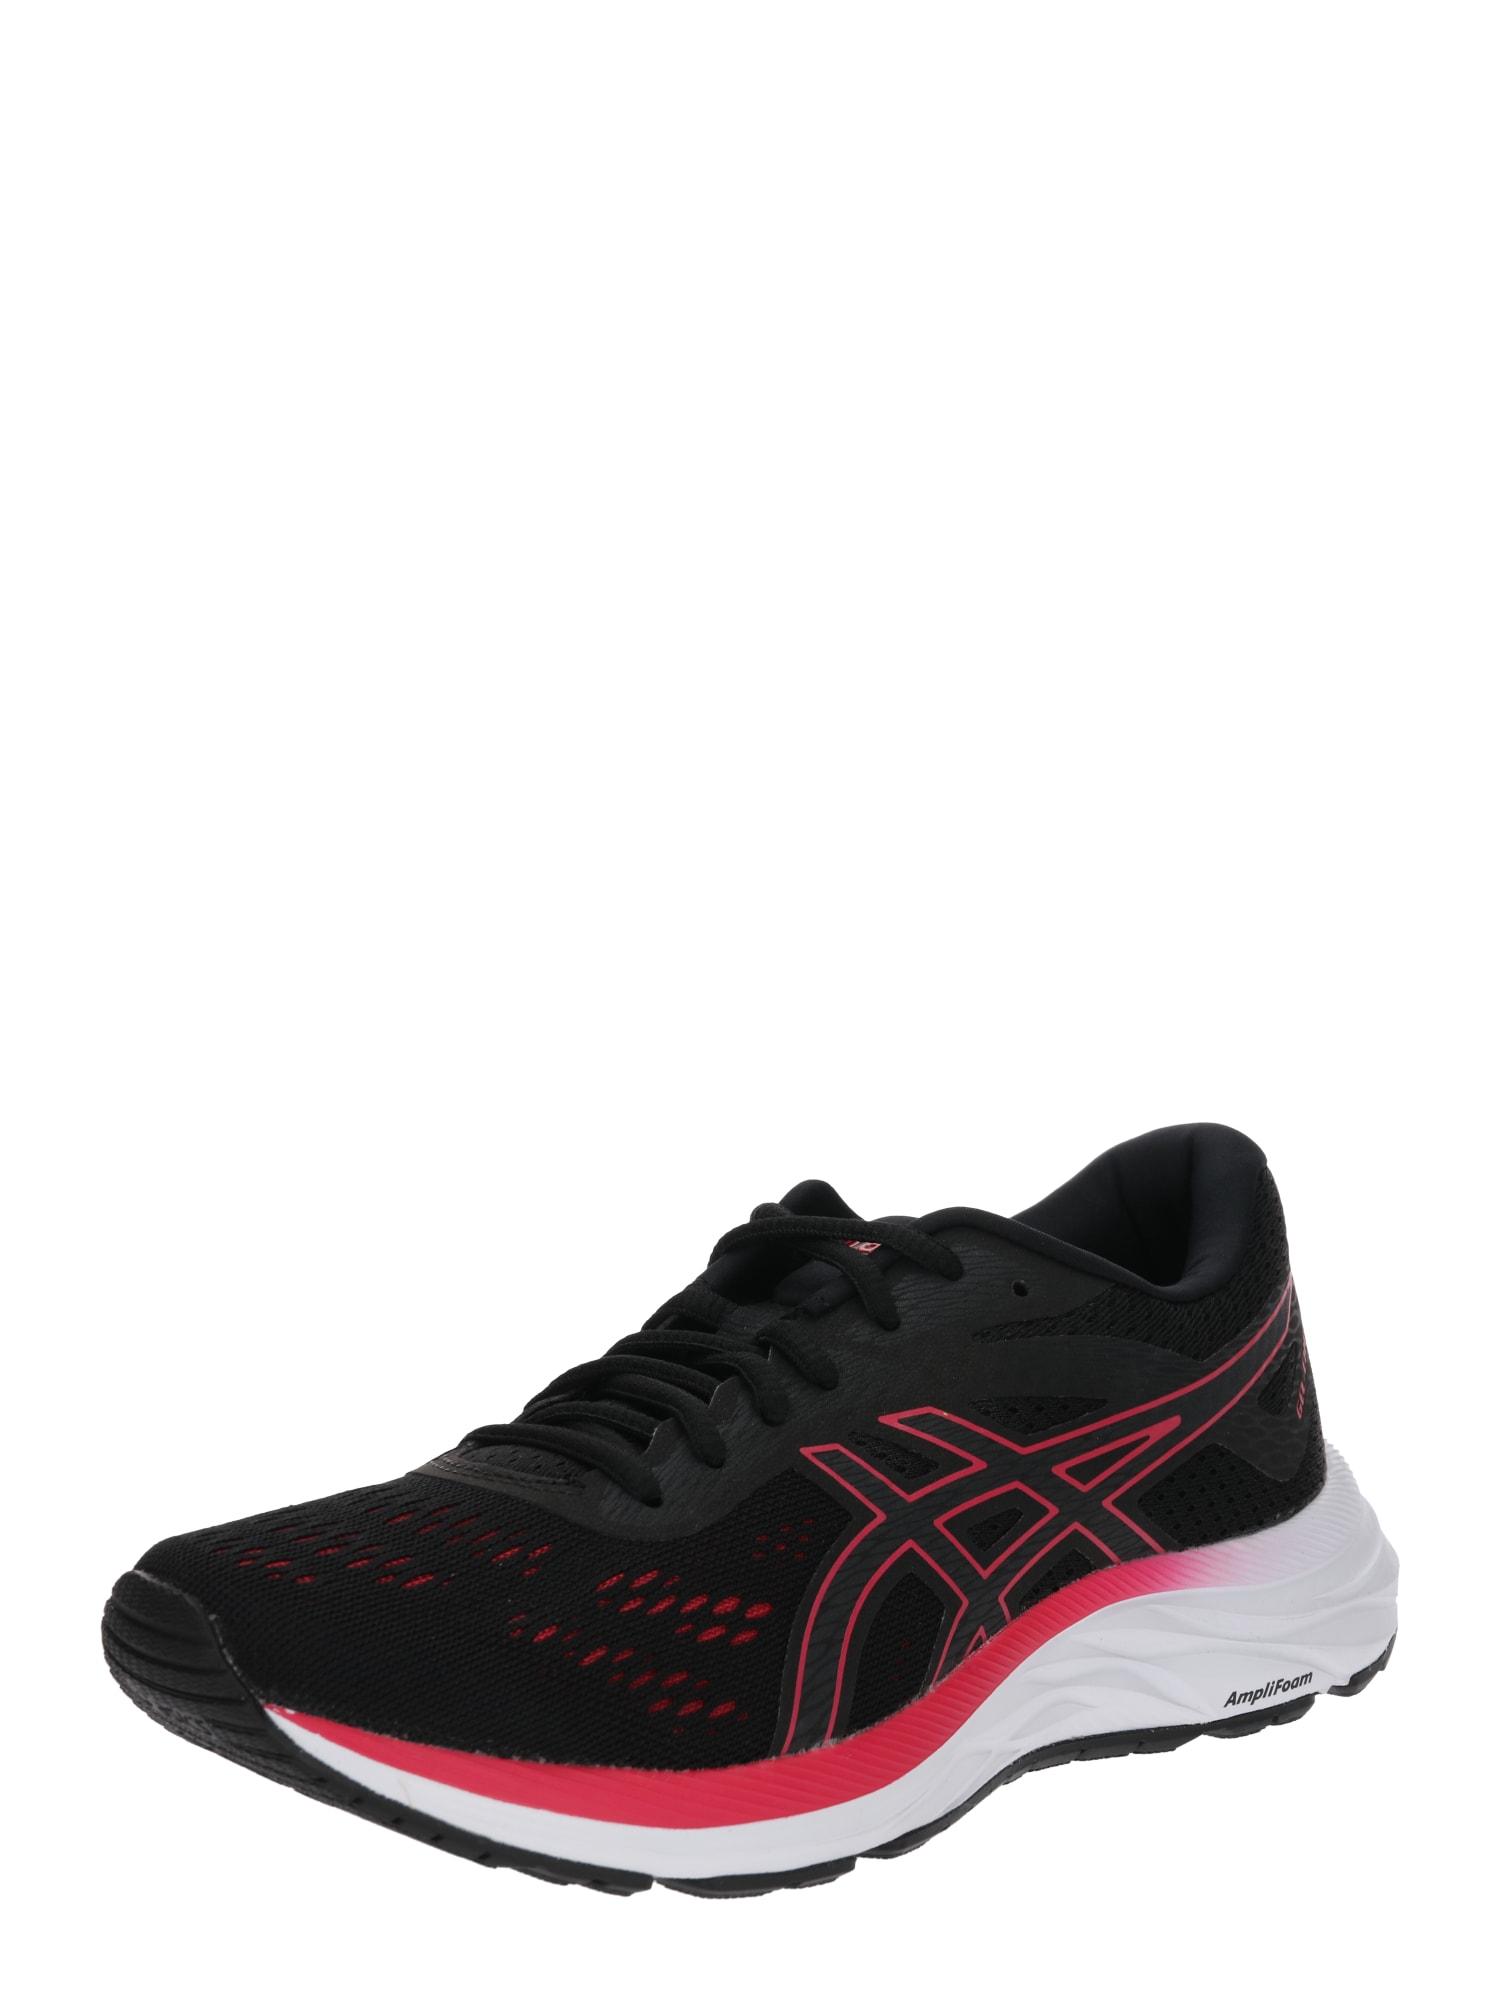 Běžecká obuv Gel-Excite 6 červená černá ASICS